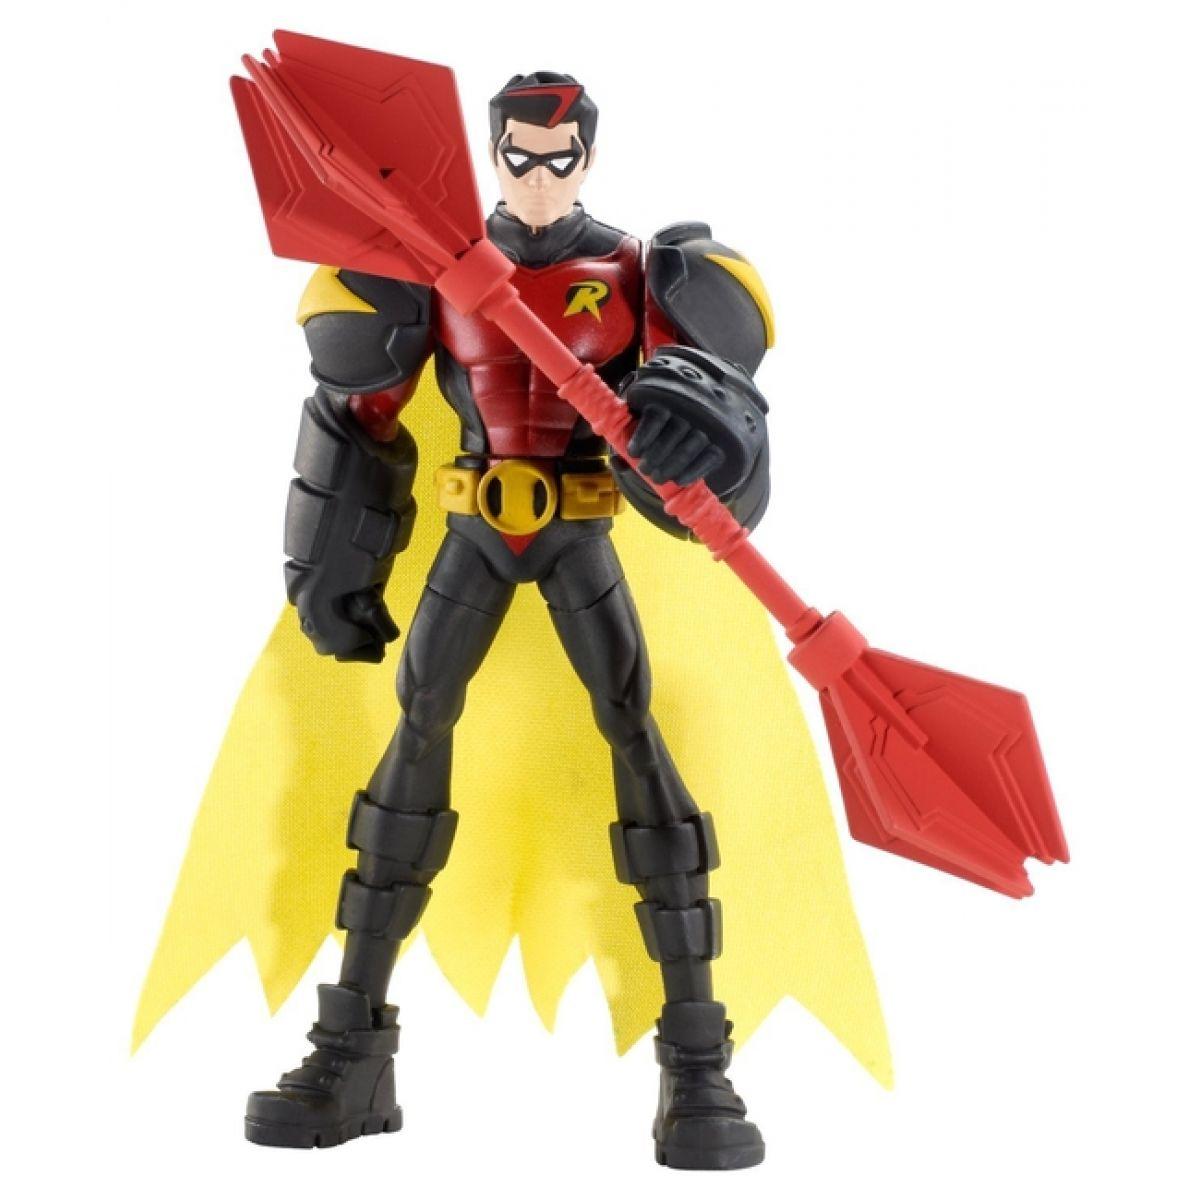 Batman bojové figurky Mattel W7256 - Robin